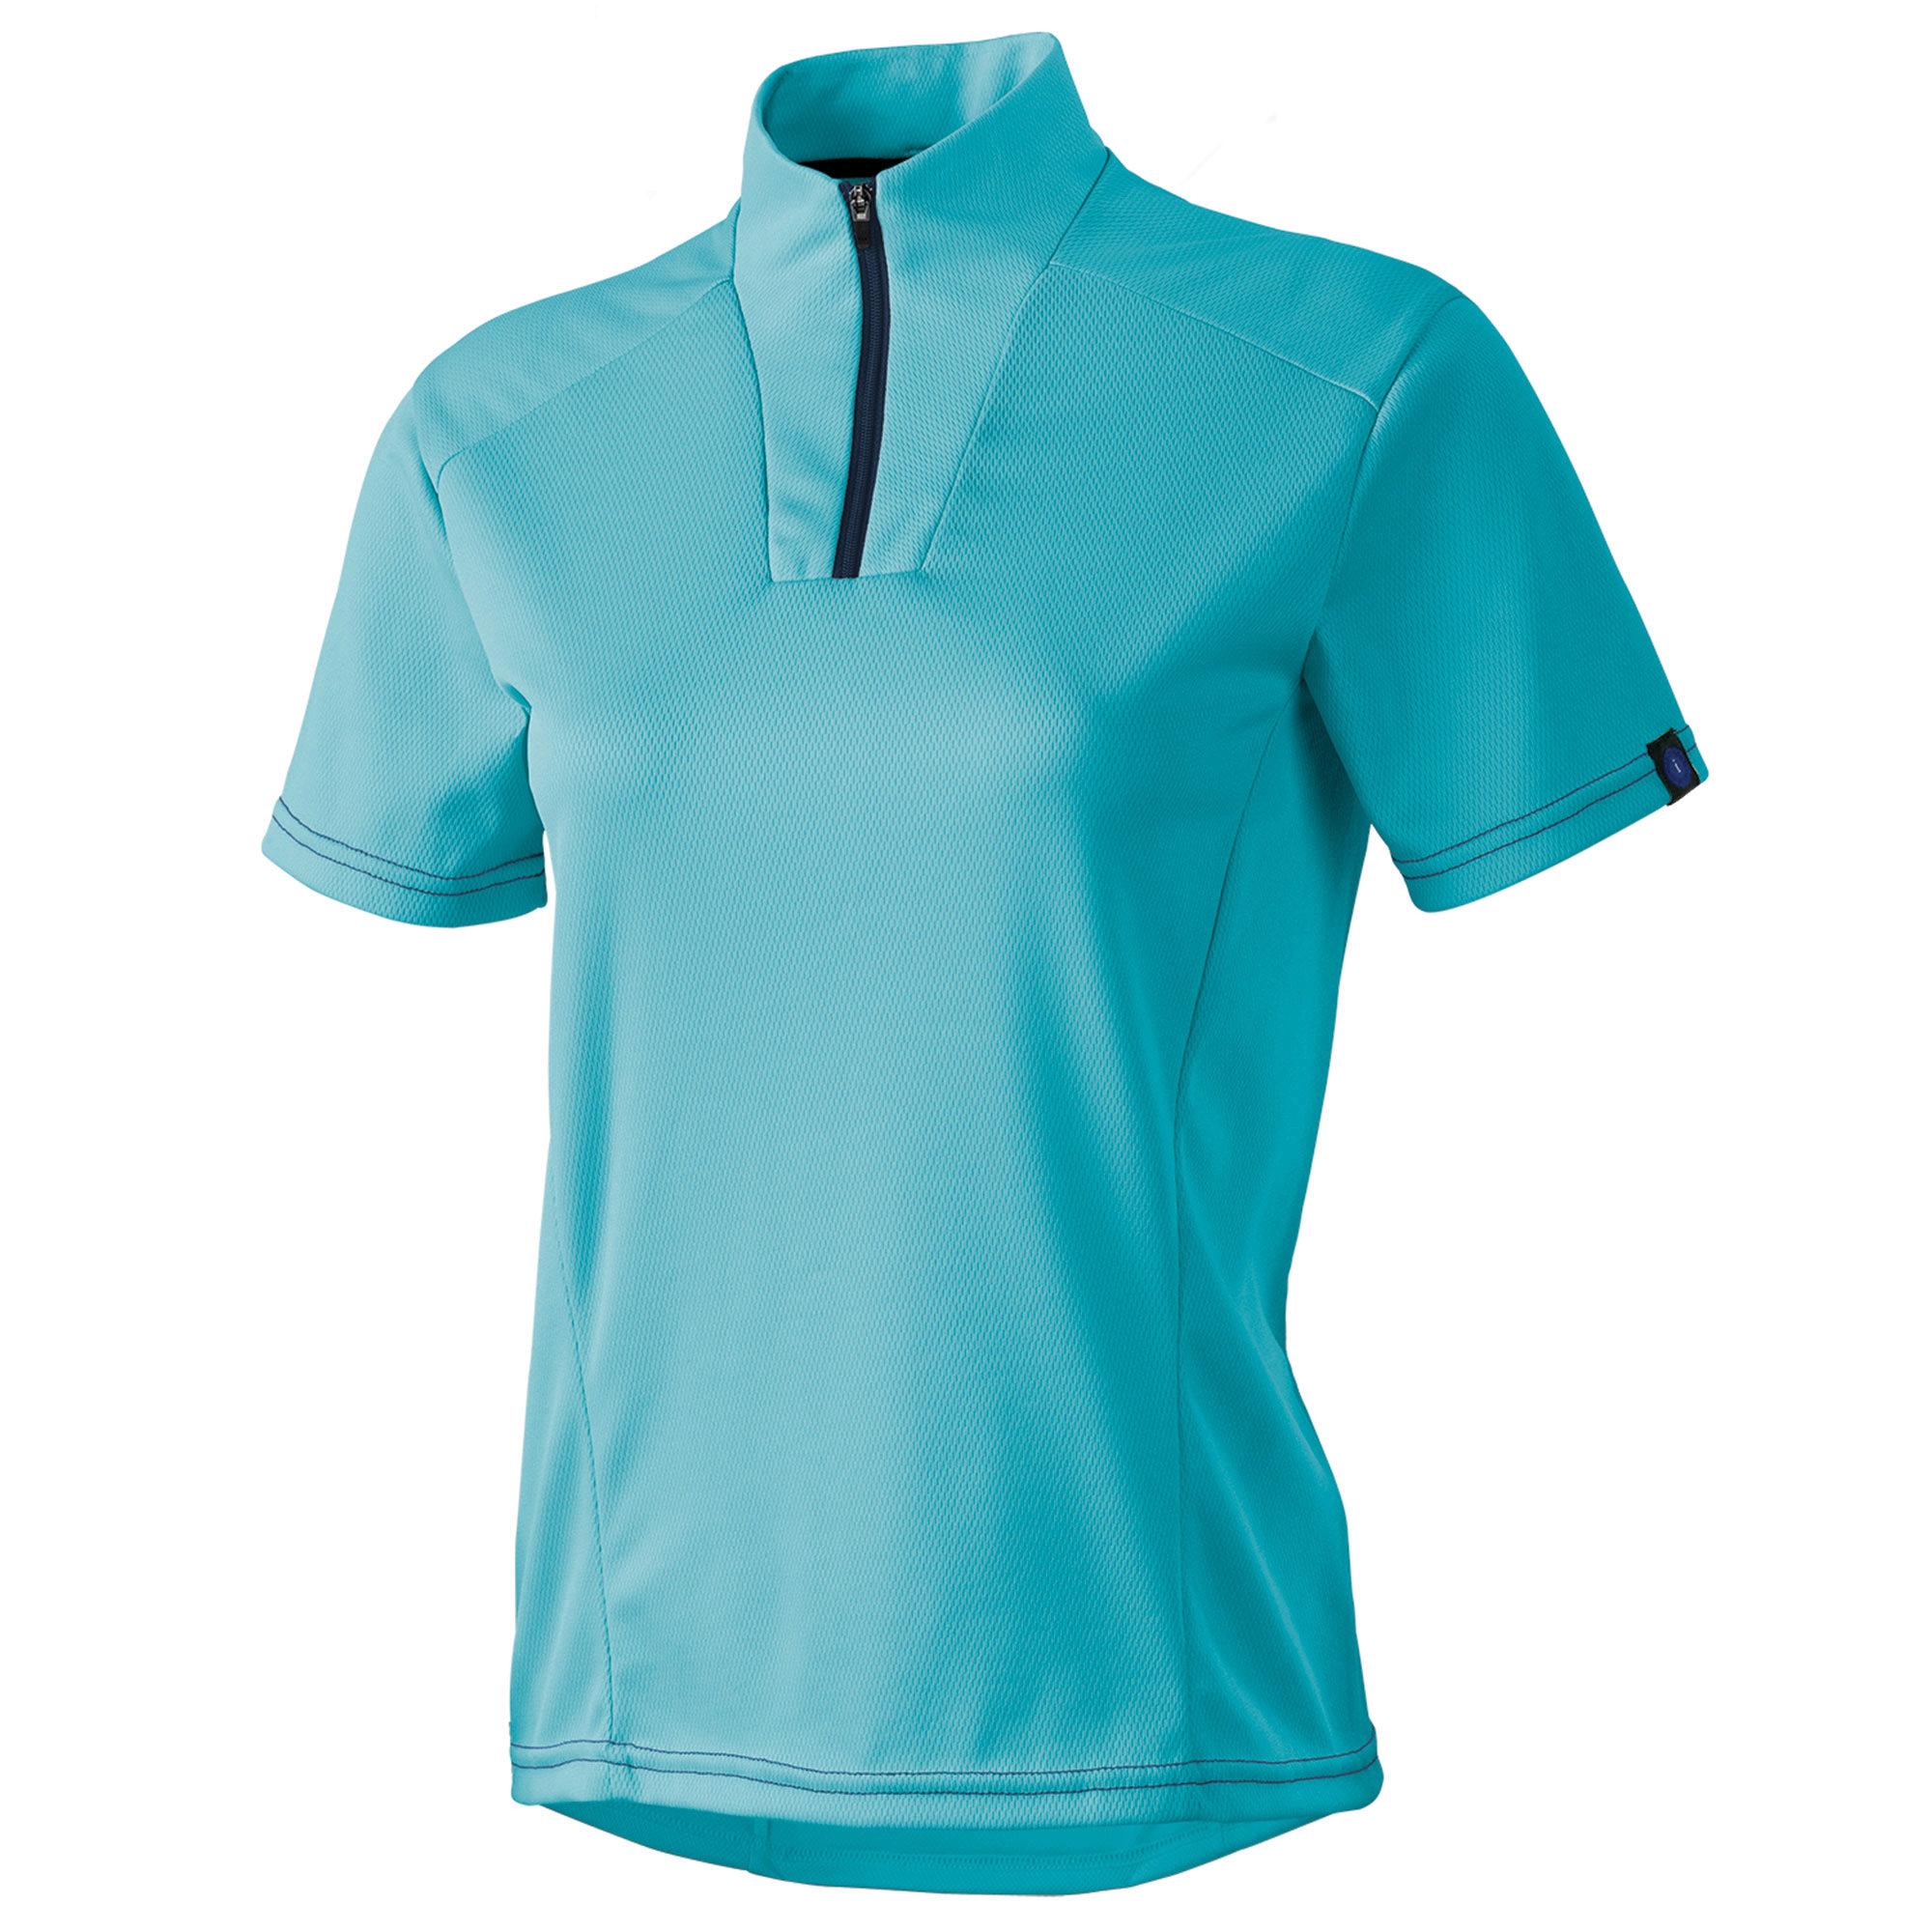 Irideon Kids' Radiance Short Sleeve Jersey